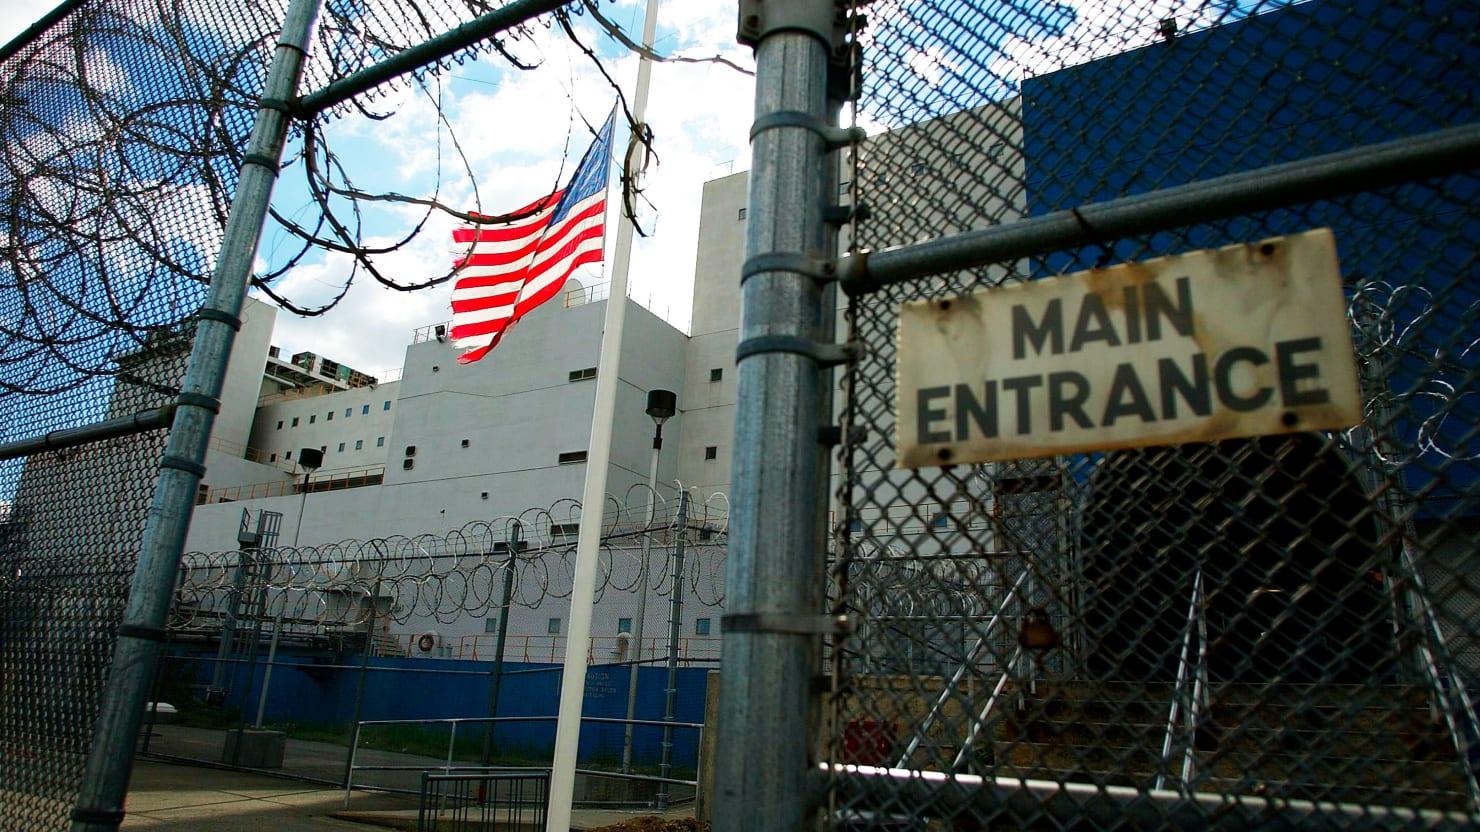 New York Prison Labor Makes Hand Sanitizer, Prepares to Dig Graves if Coronavirus Worsens